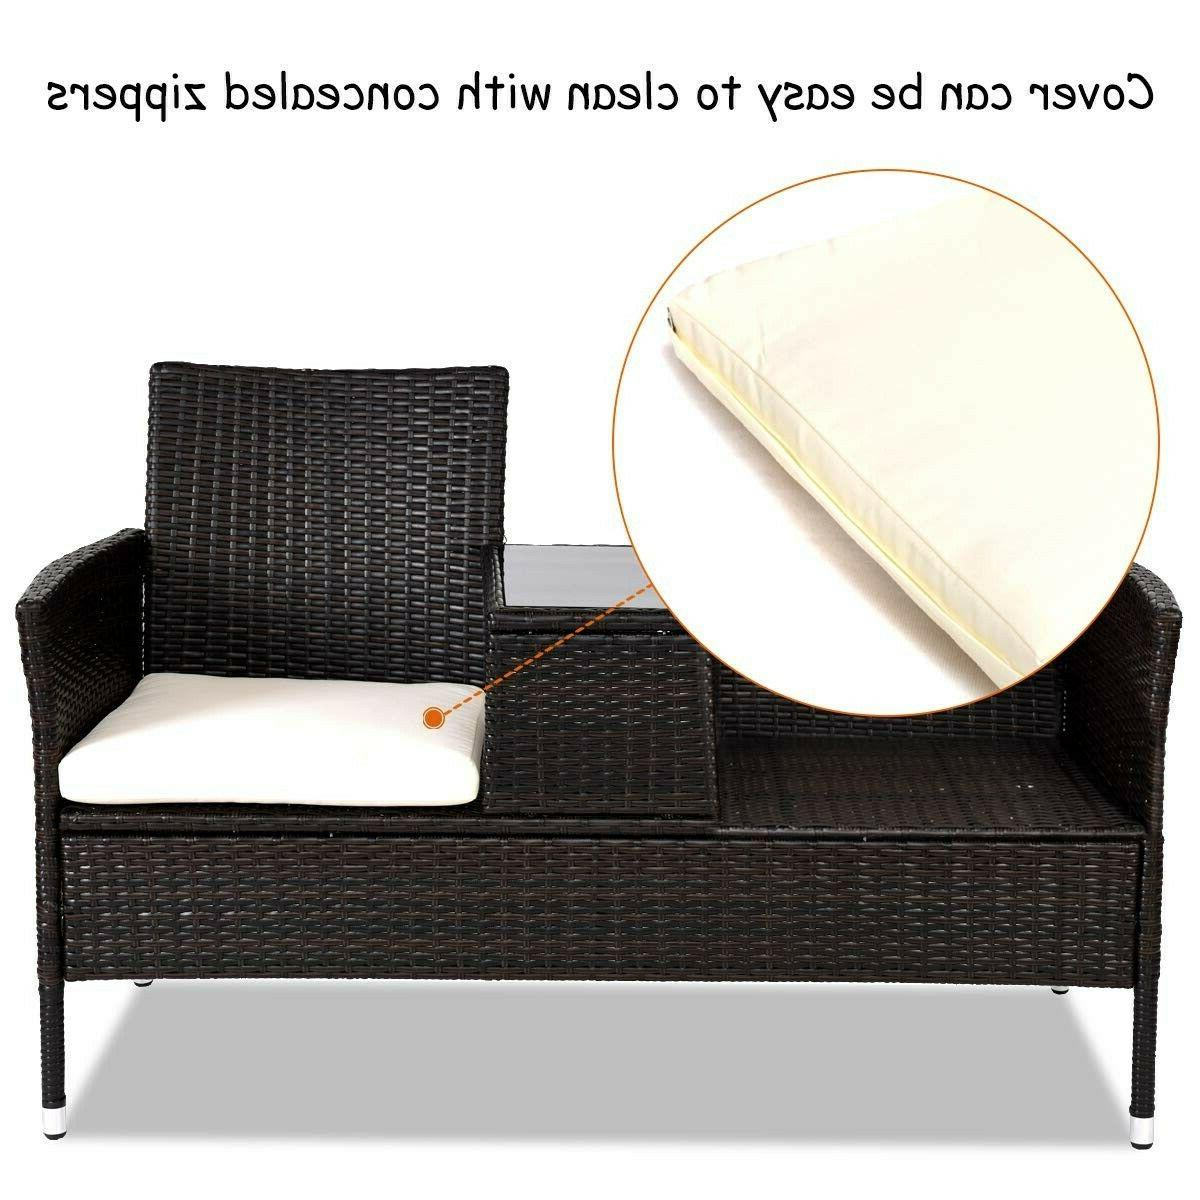 BRAND NEW Tangkula Furniture Set Removable Cushions